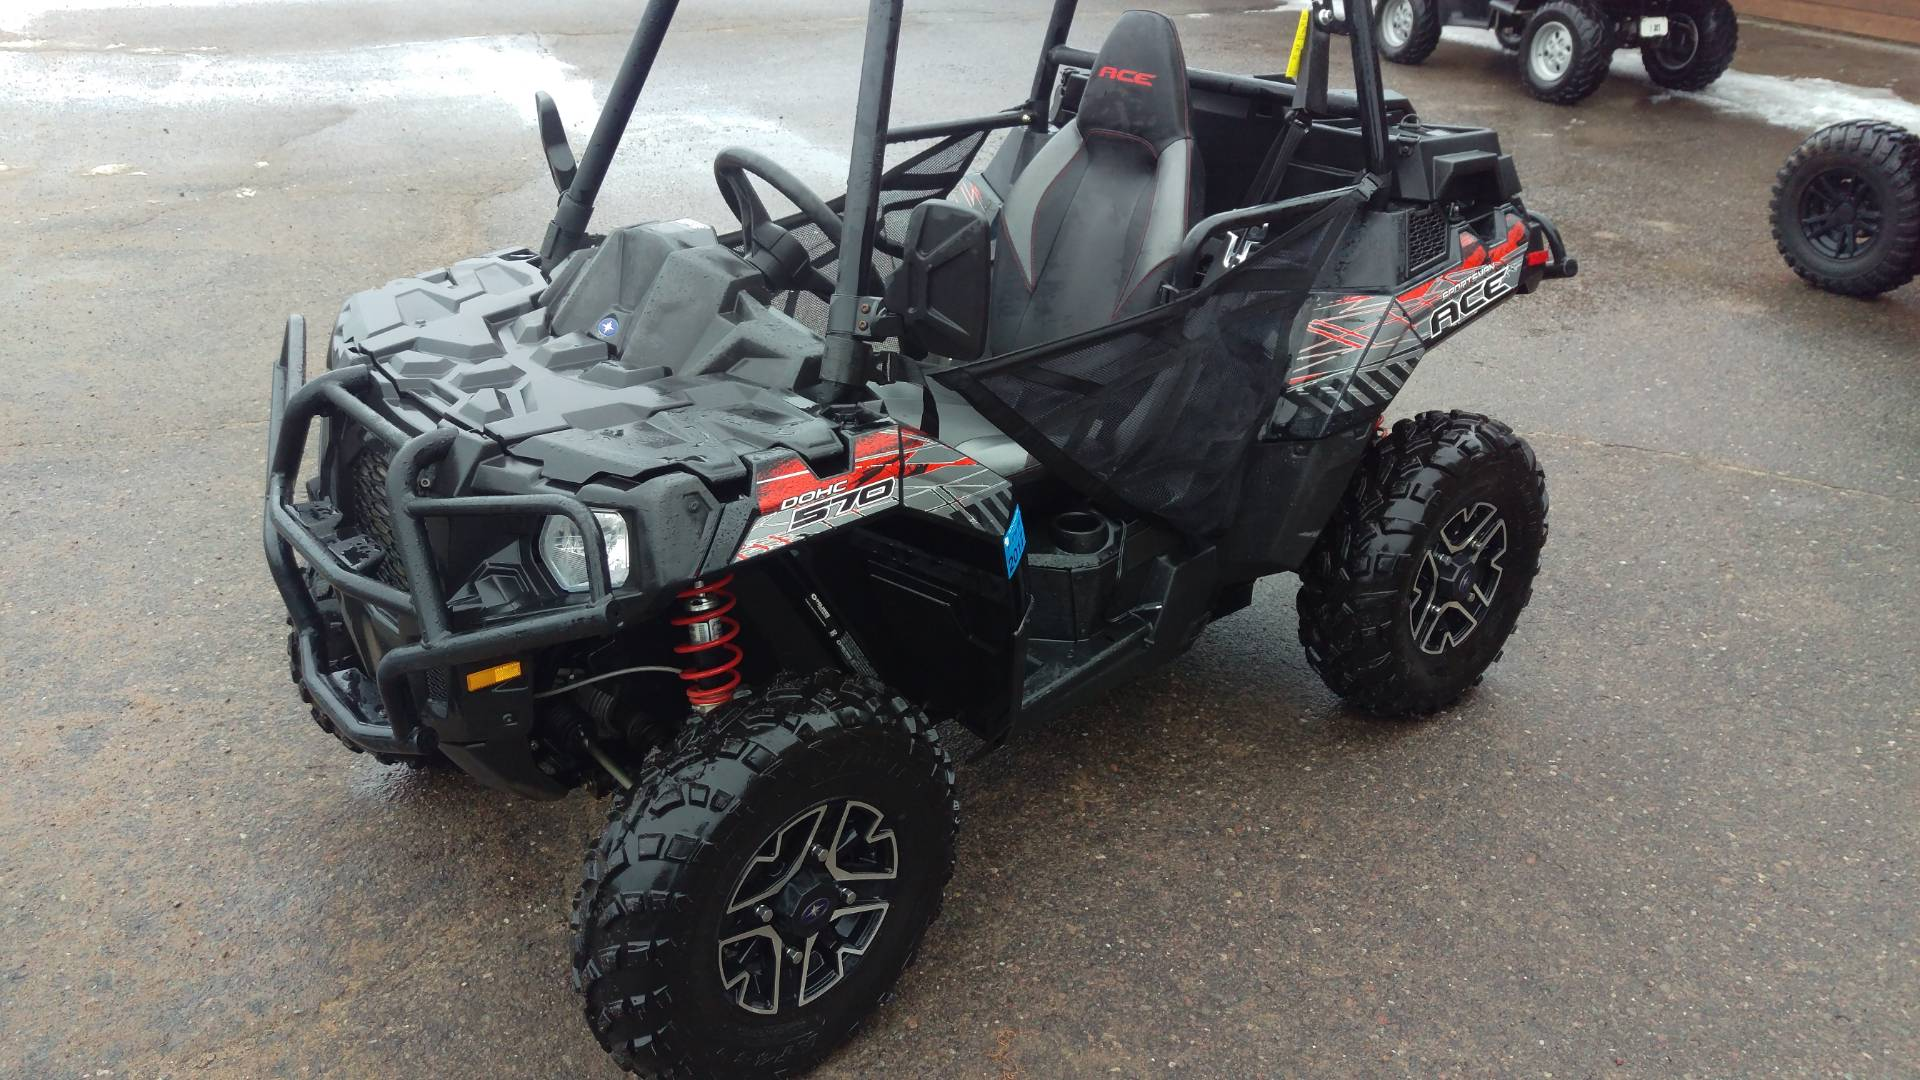 2015 Polaris ACE™ 570 SP in Trego, Wisconsin